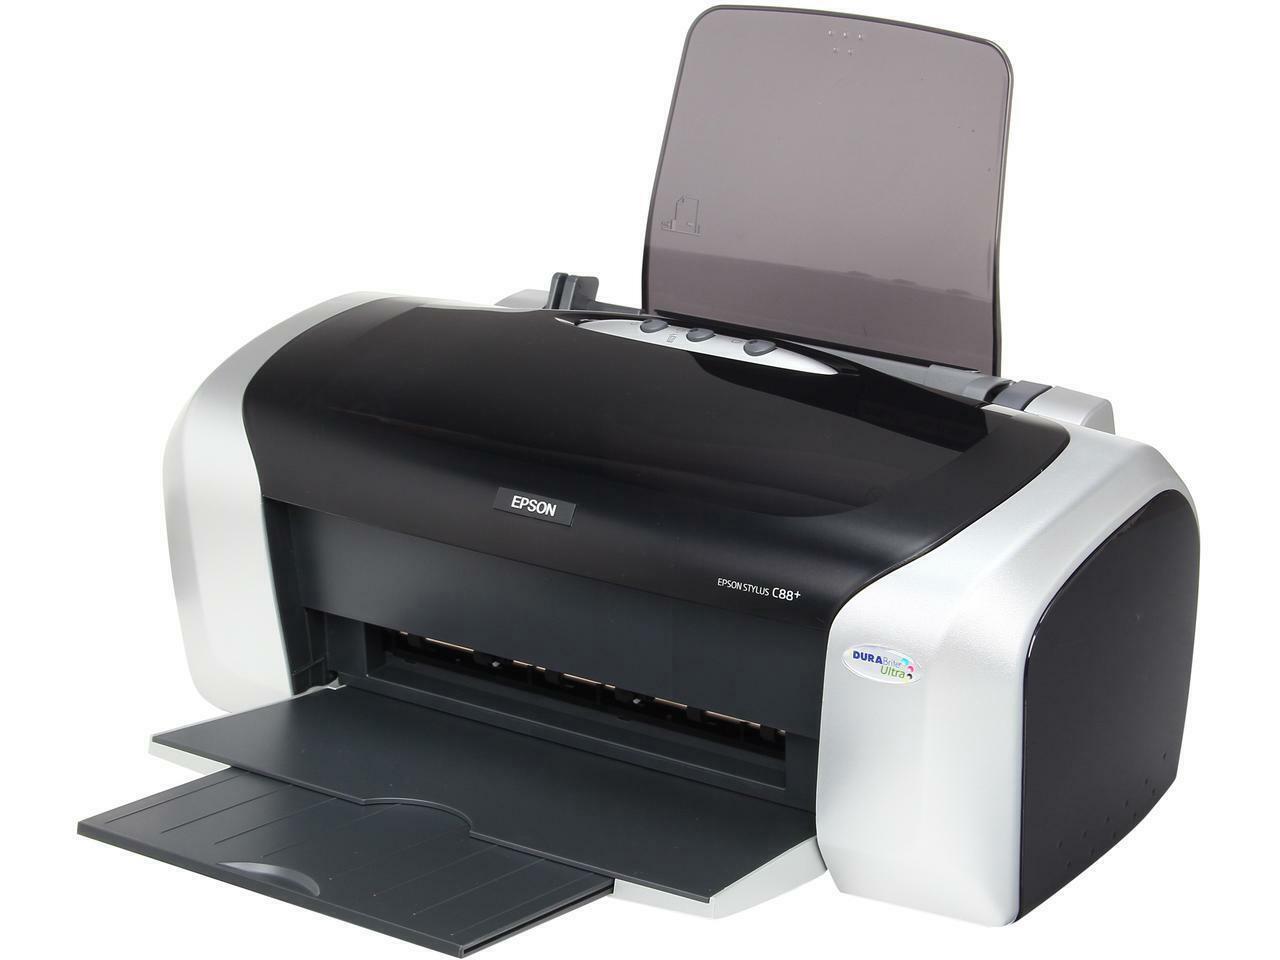 Epson Stylus C88+ Digital Photo Inkjet Printer